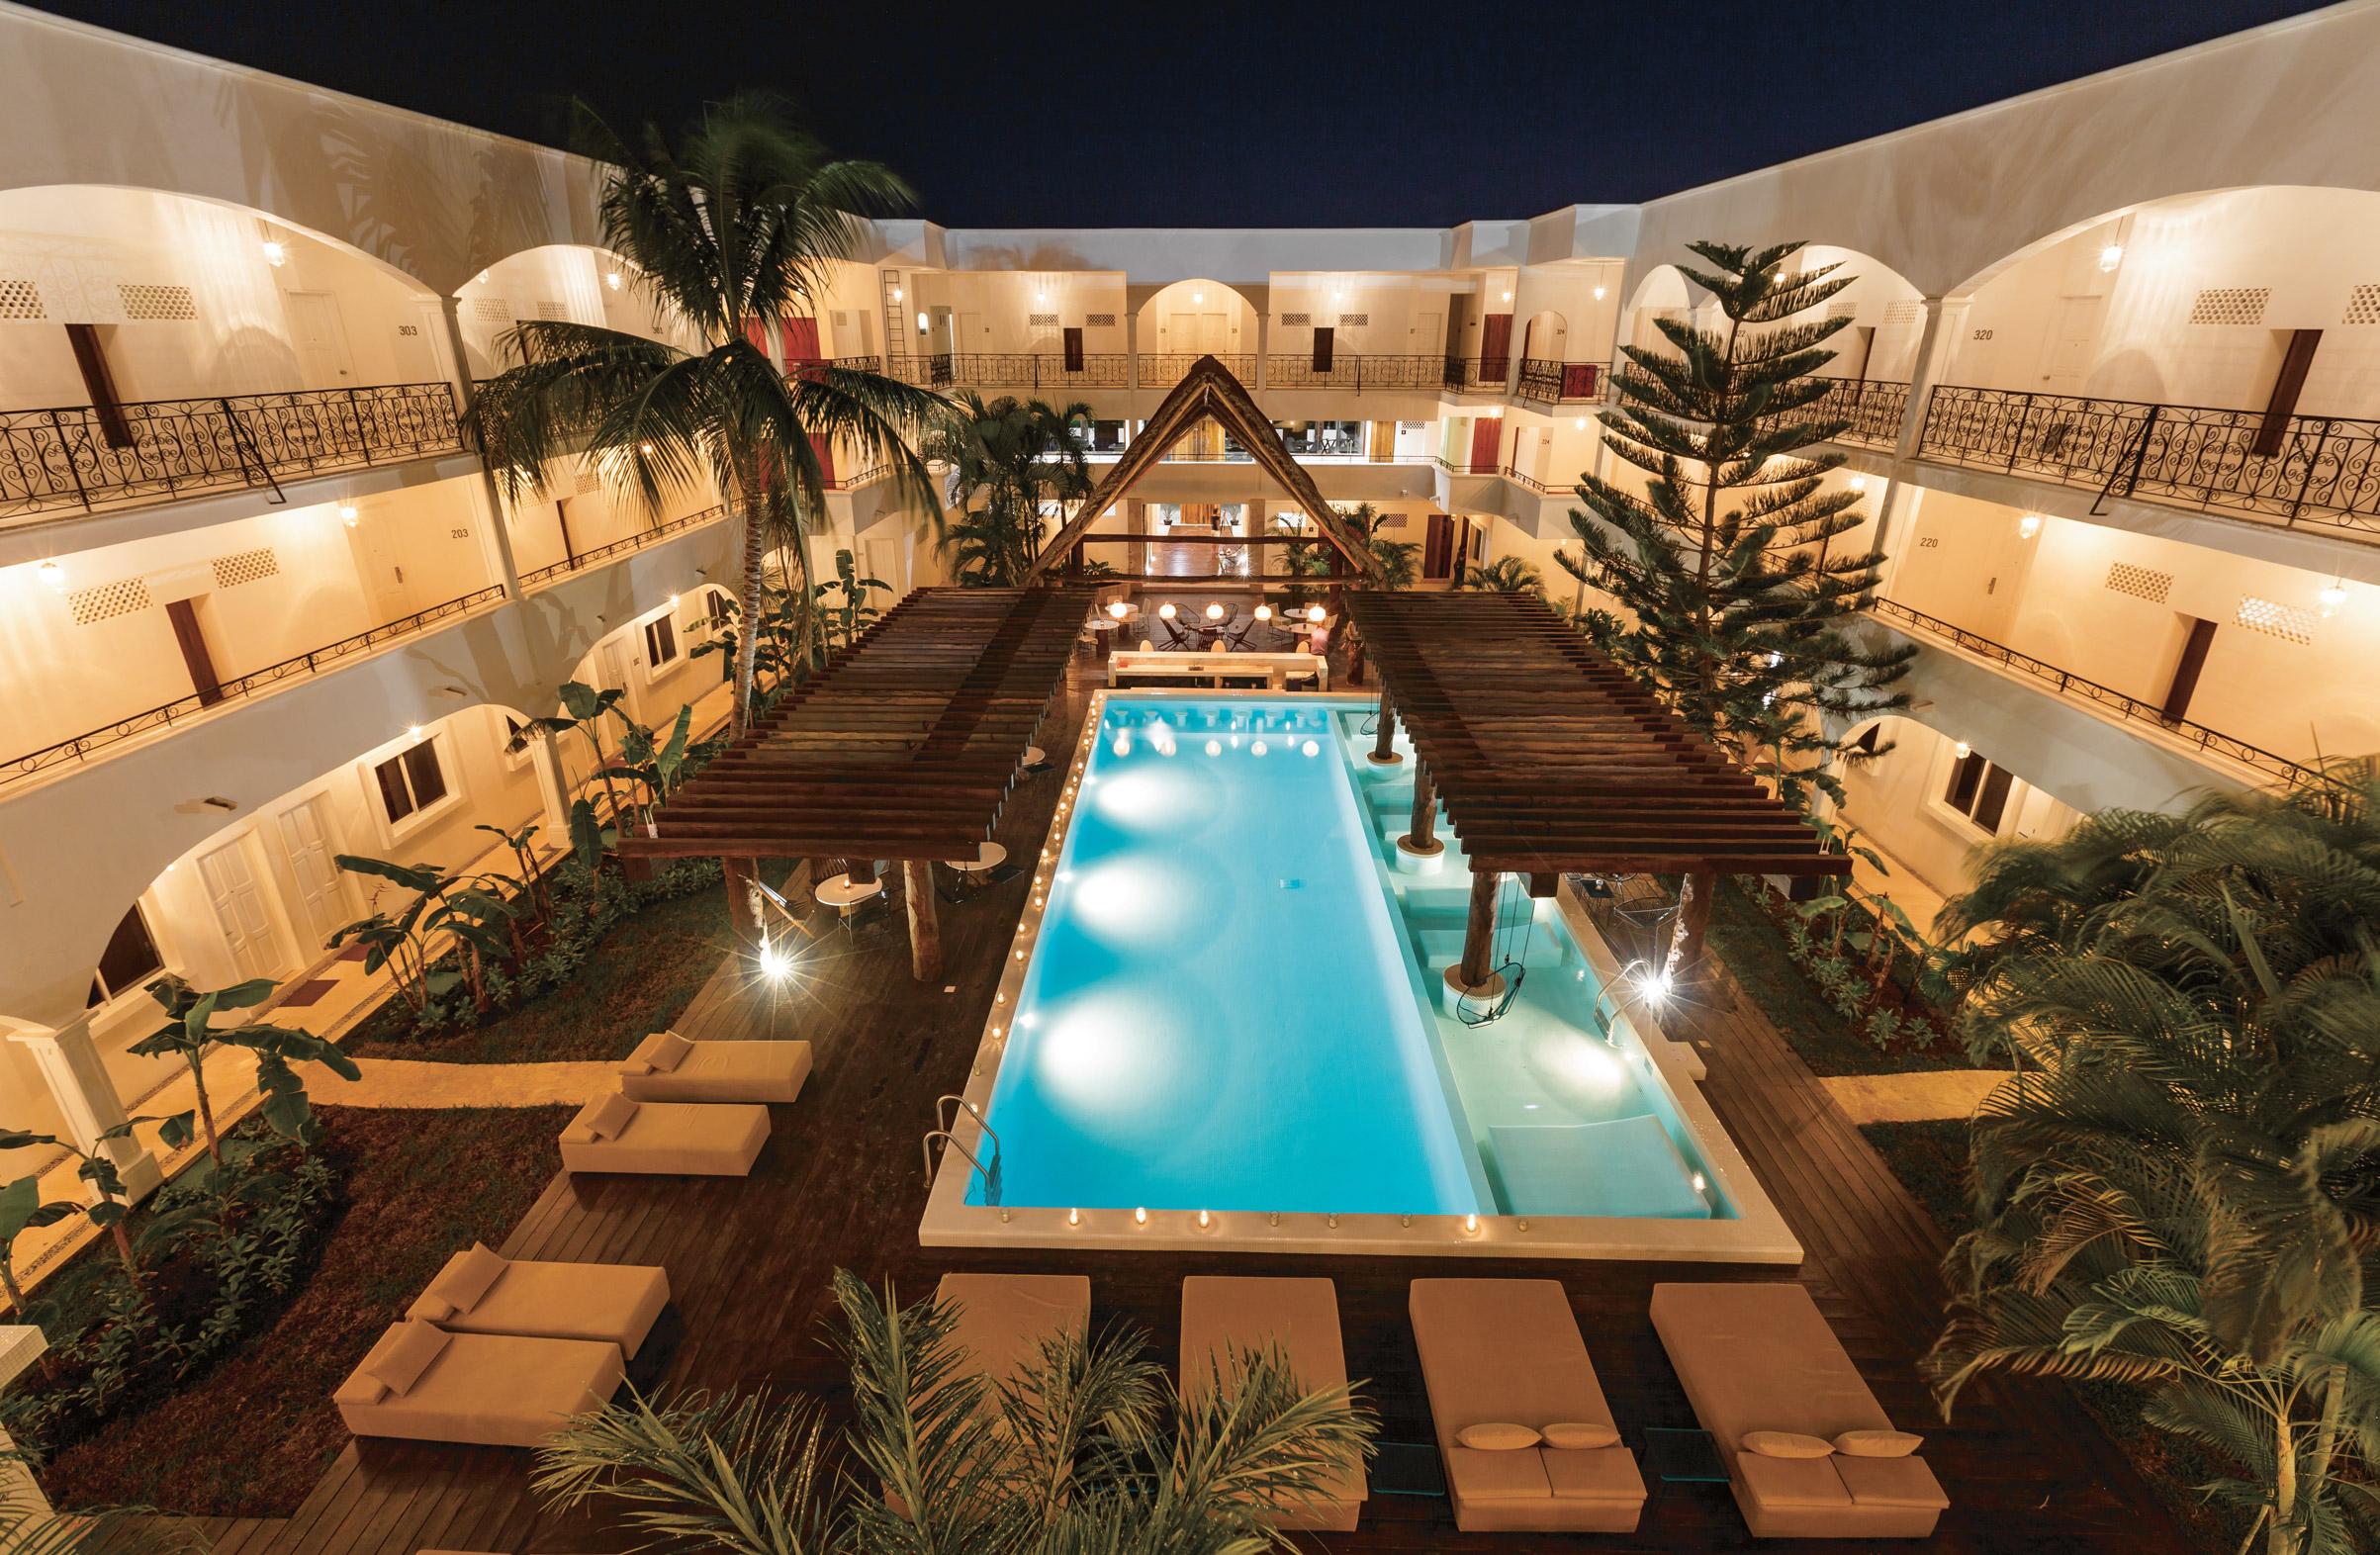 hm playa del carmen riviera maya transat. Black Bedroom Furniture Sets. Home Design Ideas